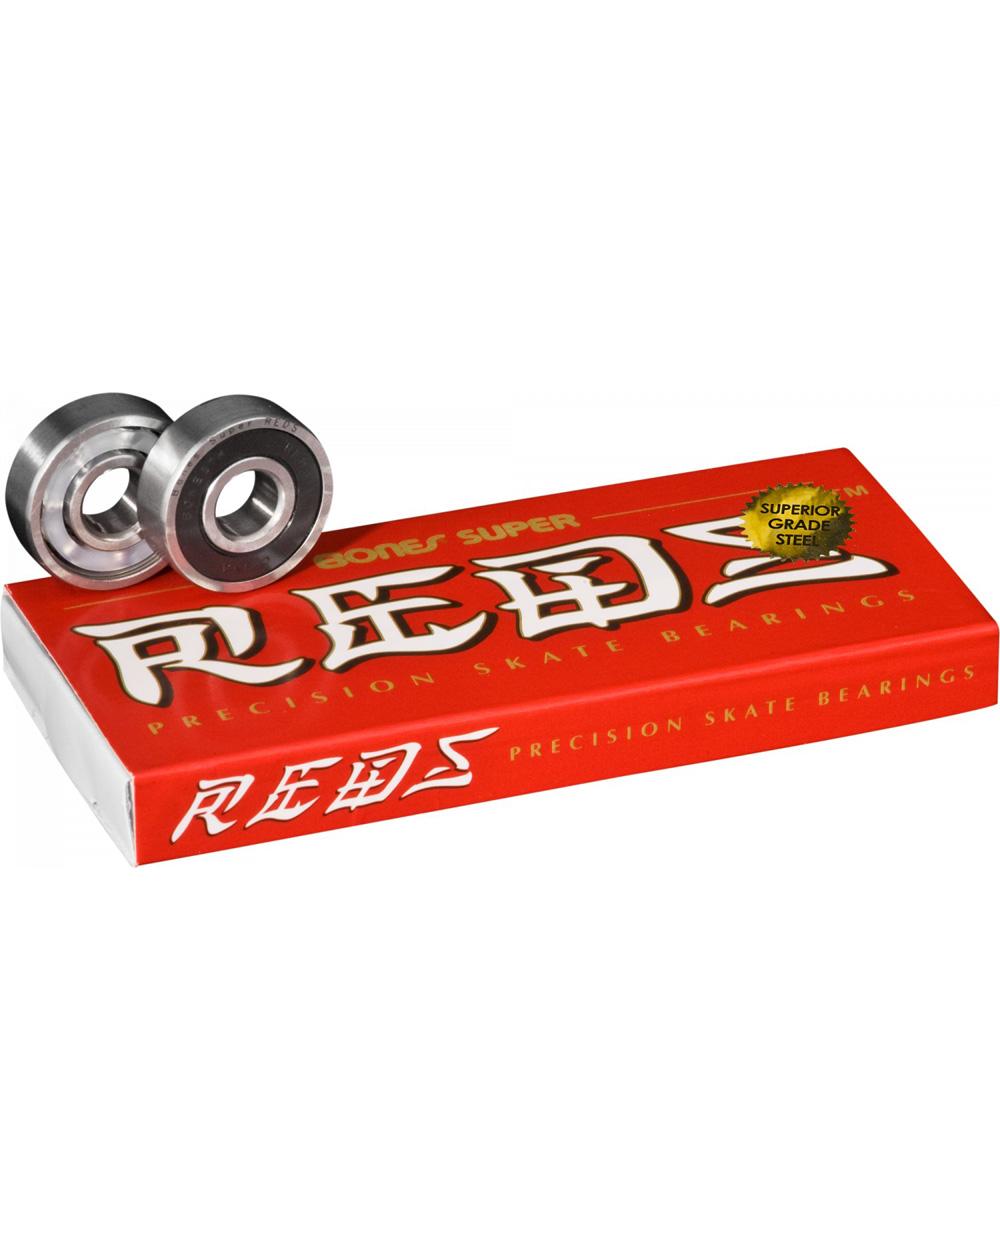 Bones Bearings Super Reds Skateboard Bearings